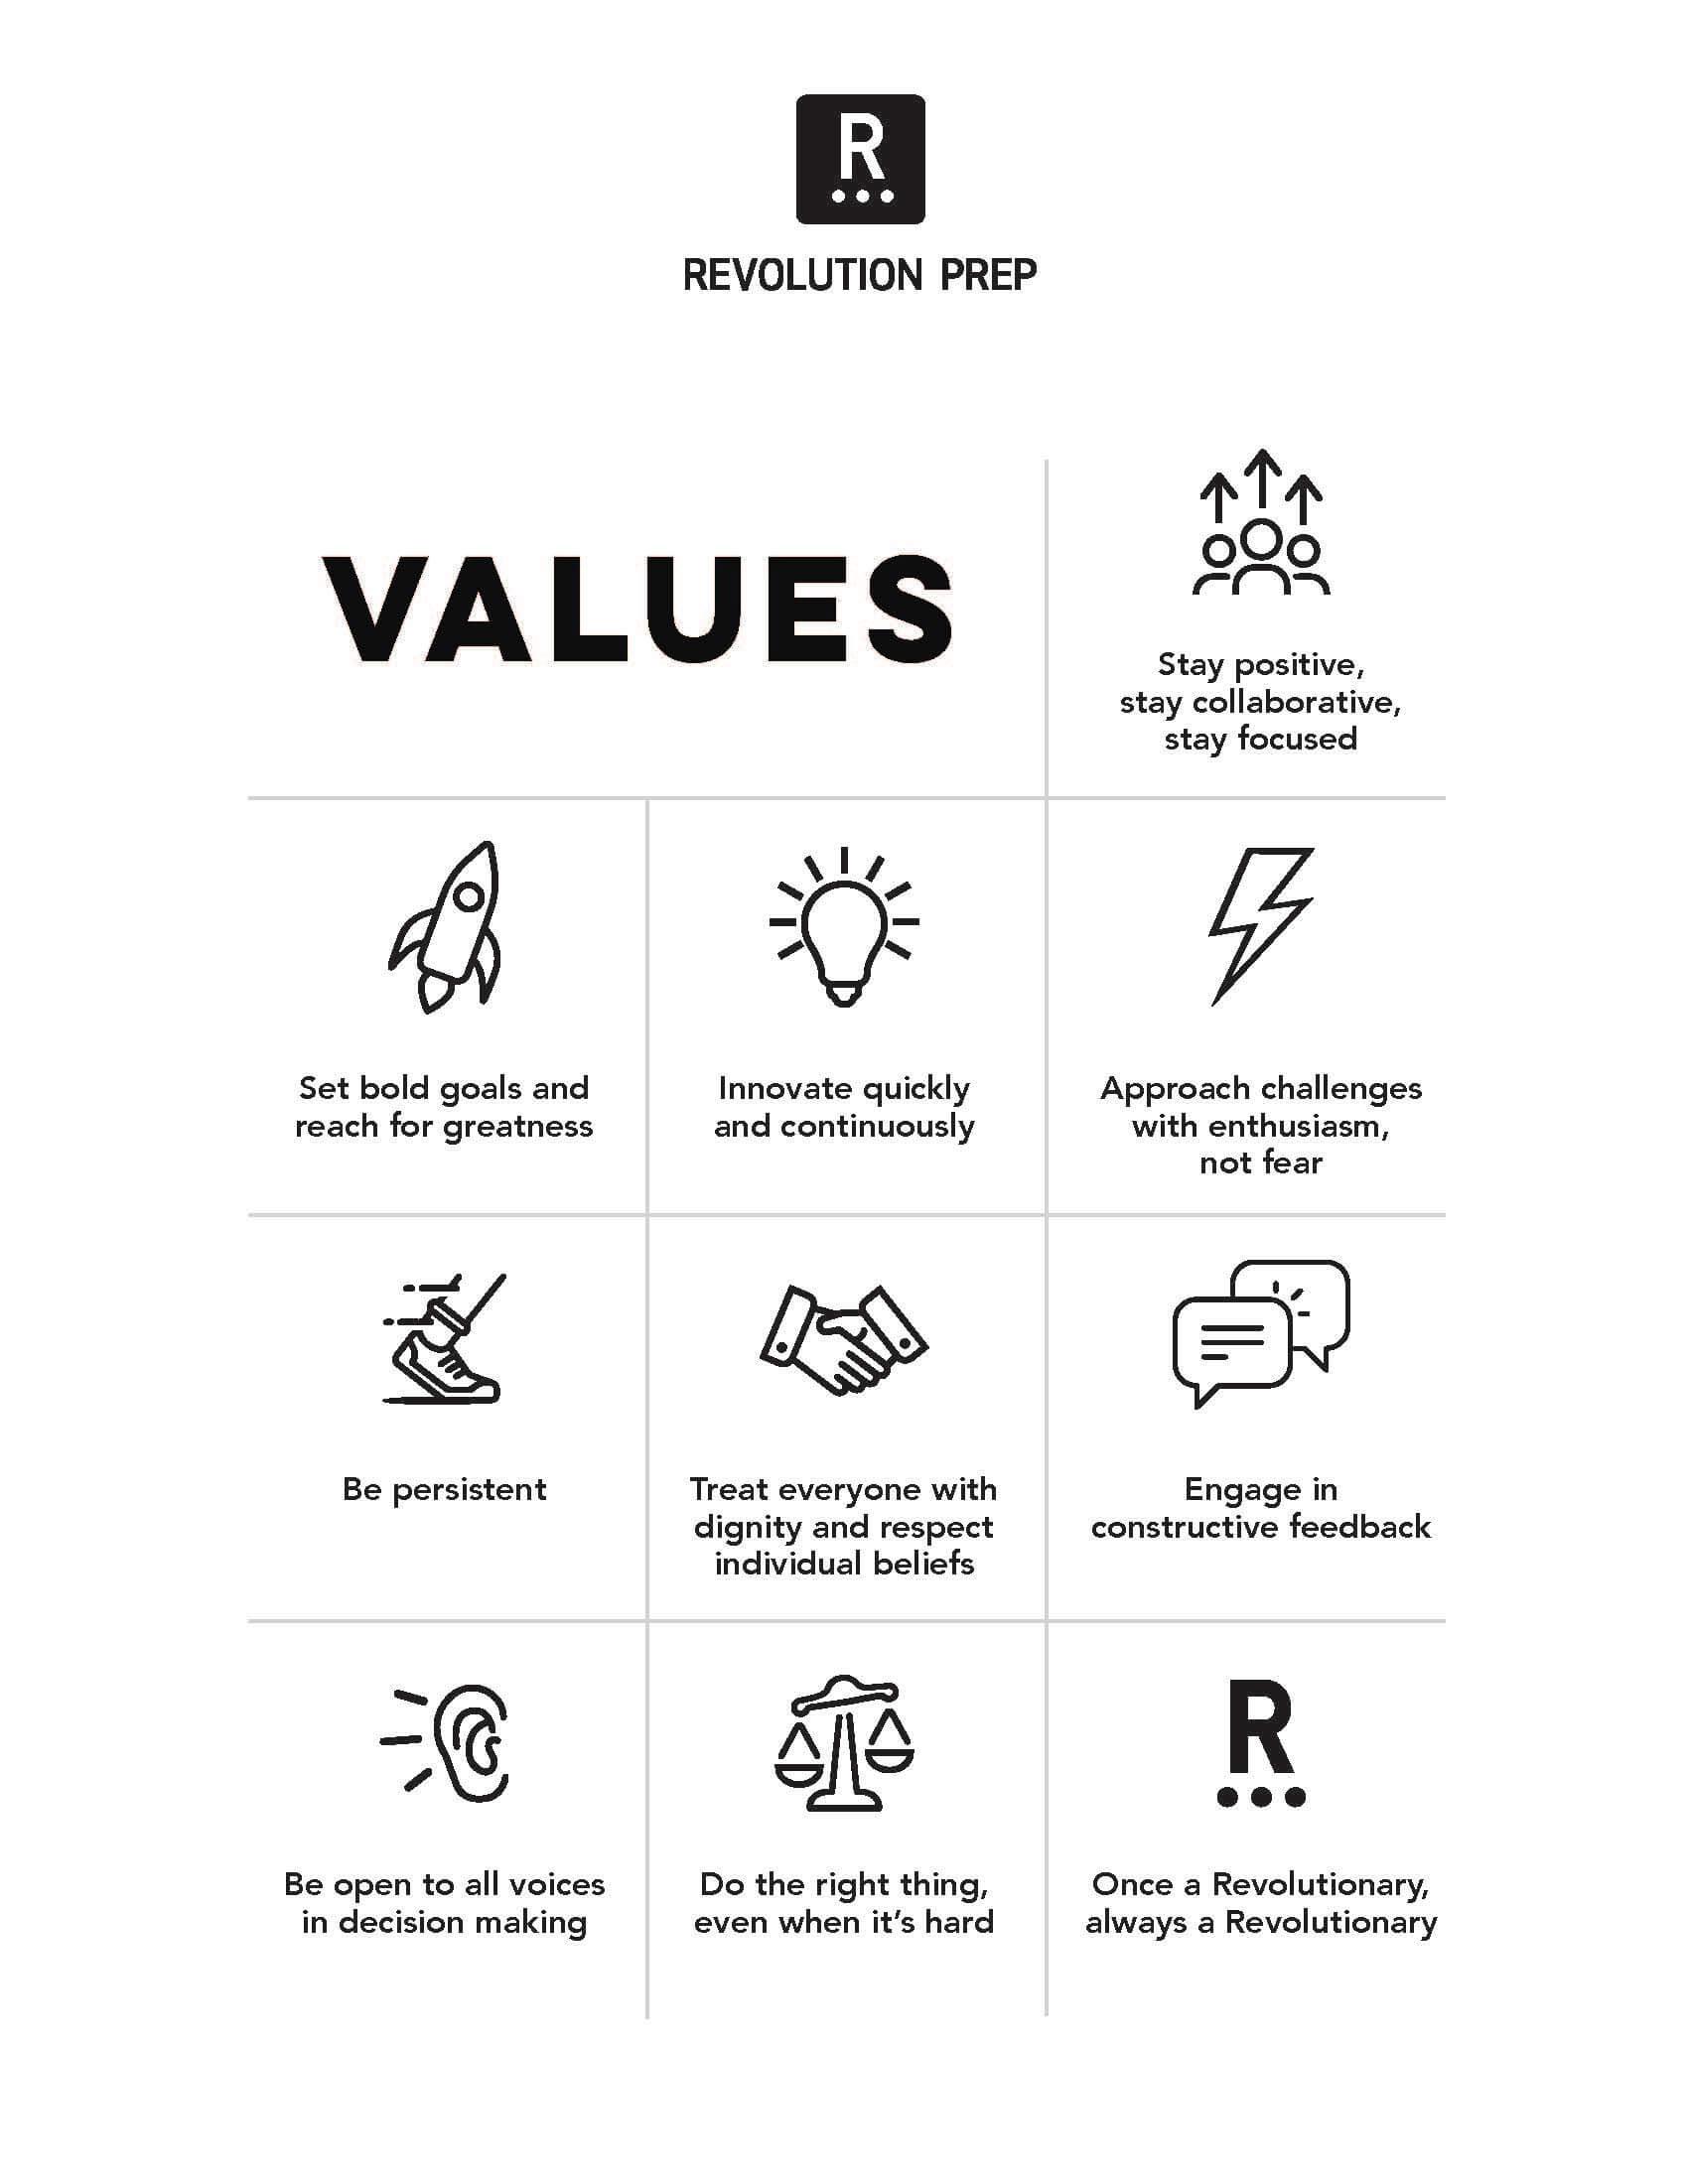 revolution prep values